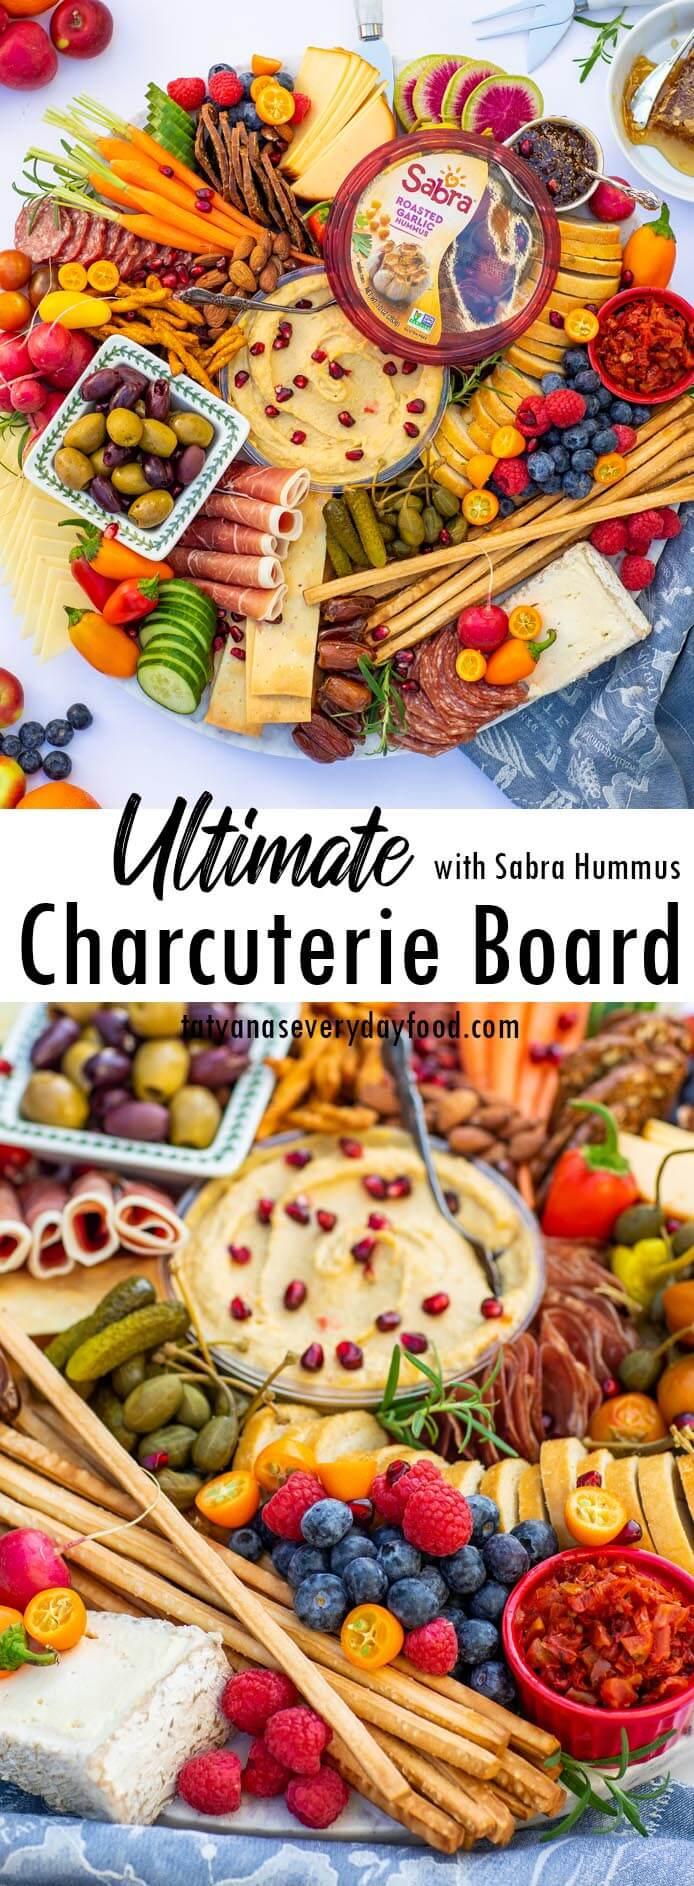 Ultimate Charcuterie Board with Sabra Hummus